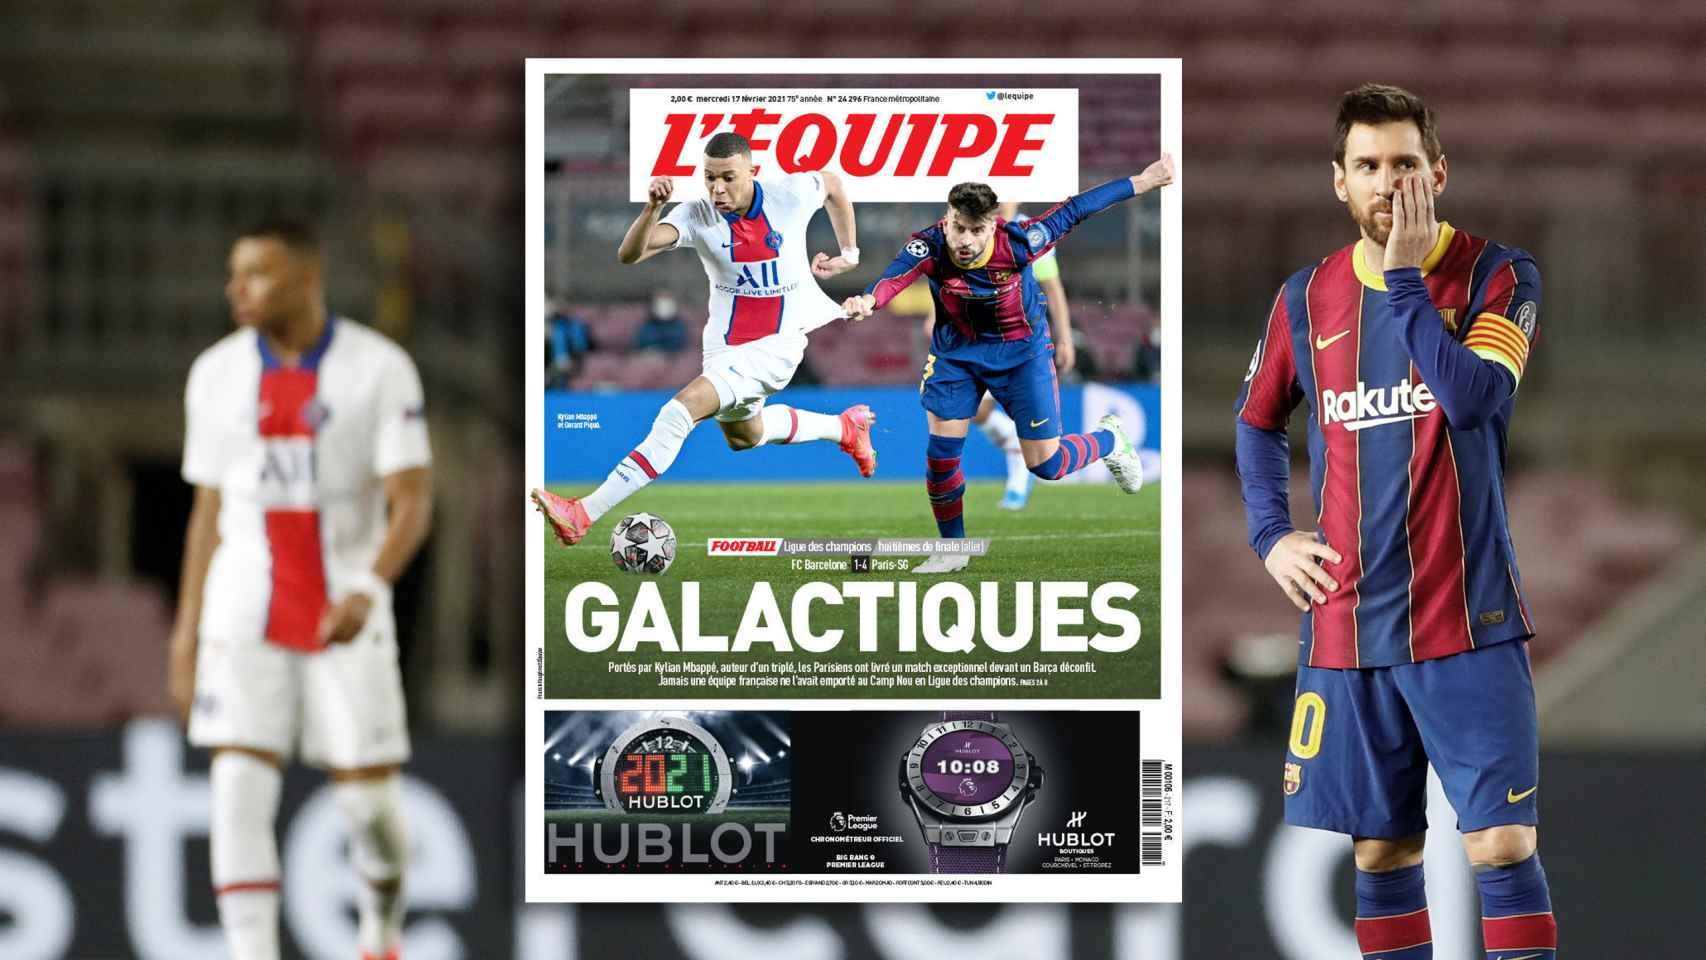 La prensa internacional 'retrata' al Barça tras el 1-4